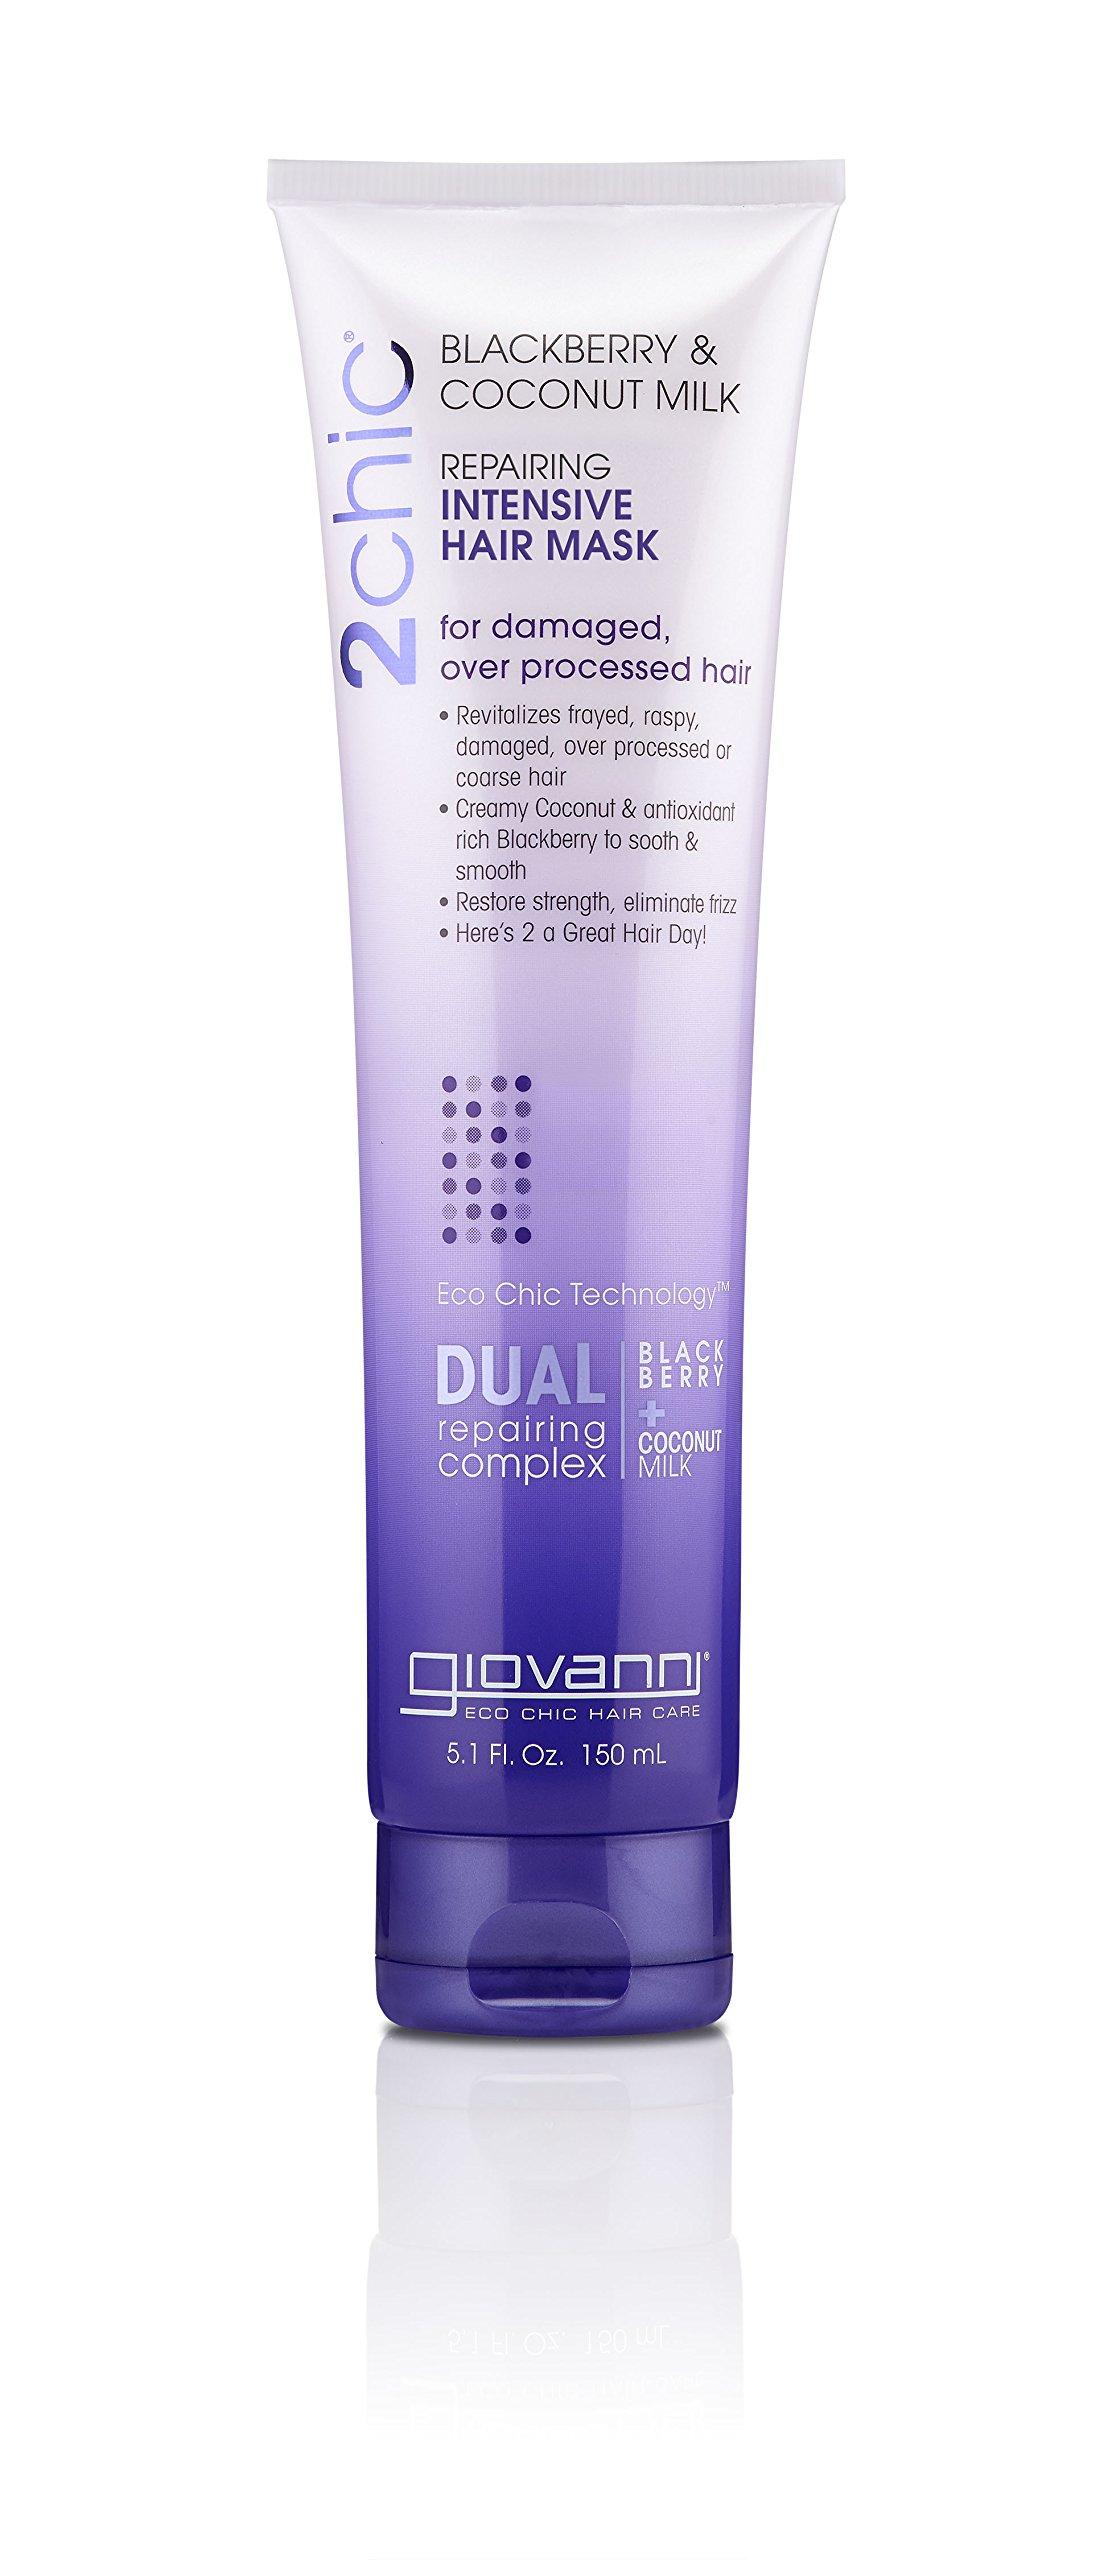 Giovanni Repairing Hair Mask Blackberry & Coconut for Dry, Damaged & Processed Hair, Argan, Jojoba, Shea Butter & Keratin, Color Safe, 5 fl oz. (Pack of 1)